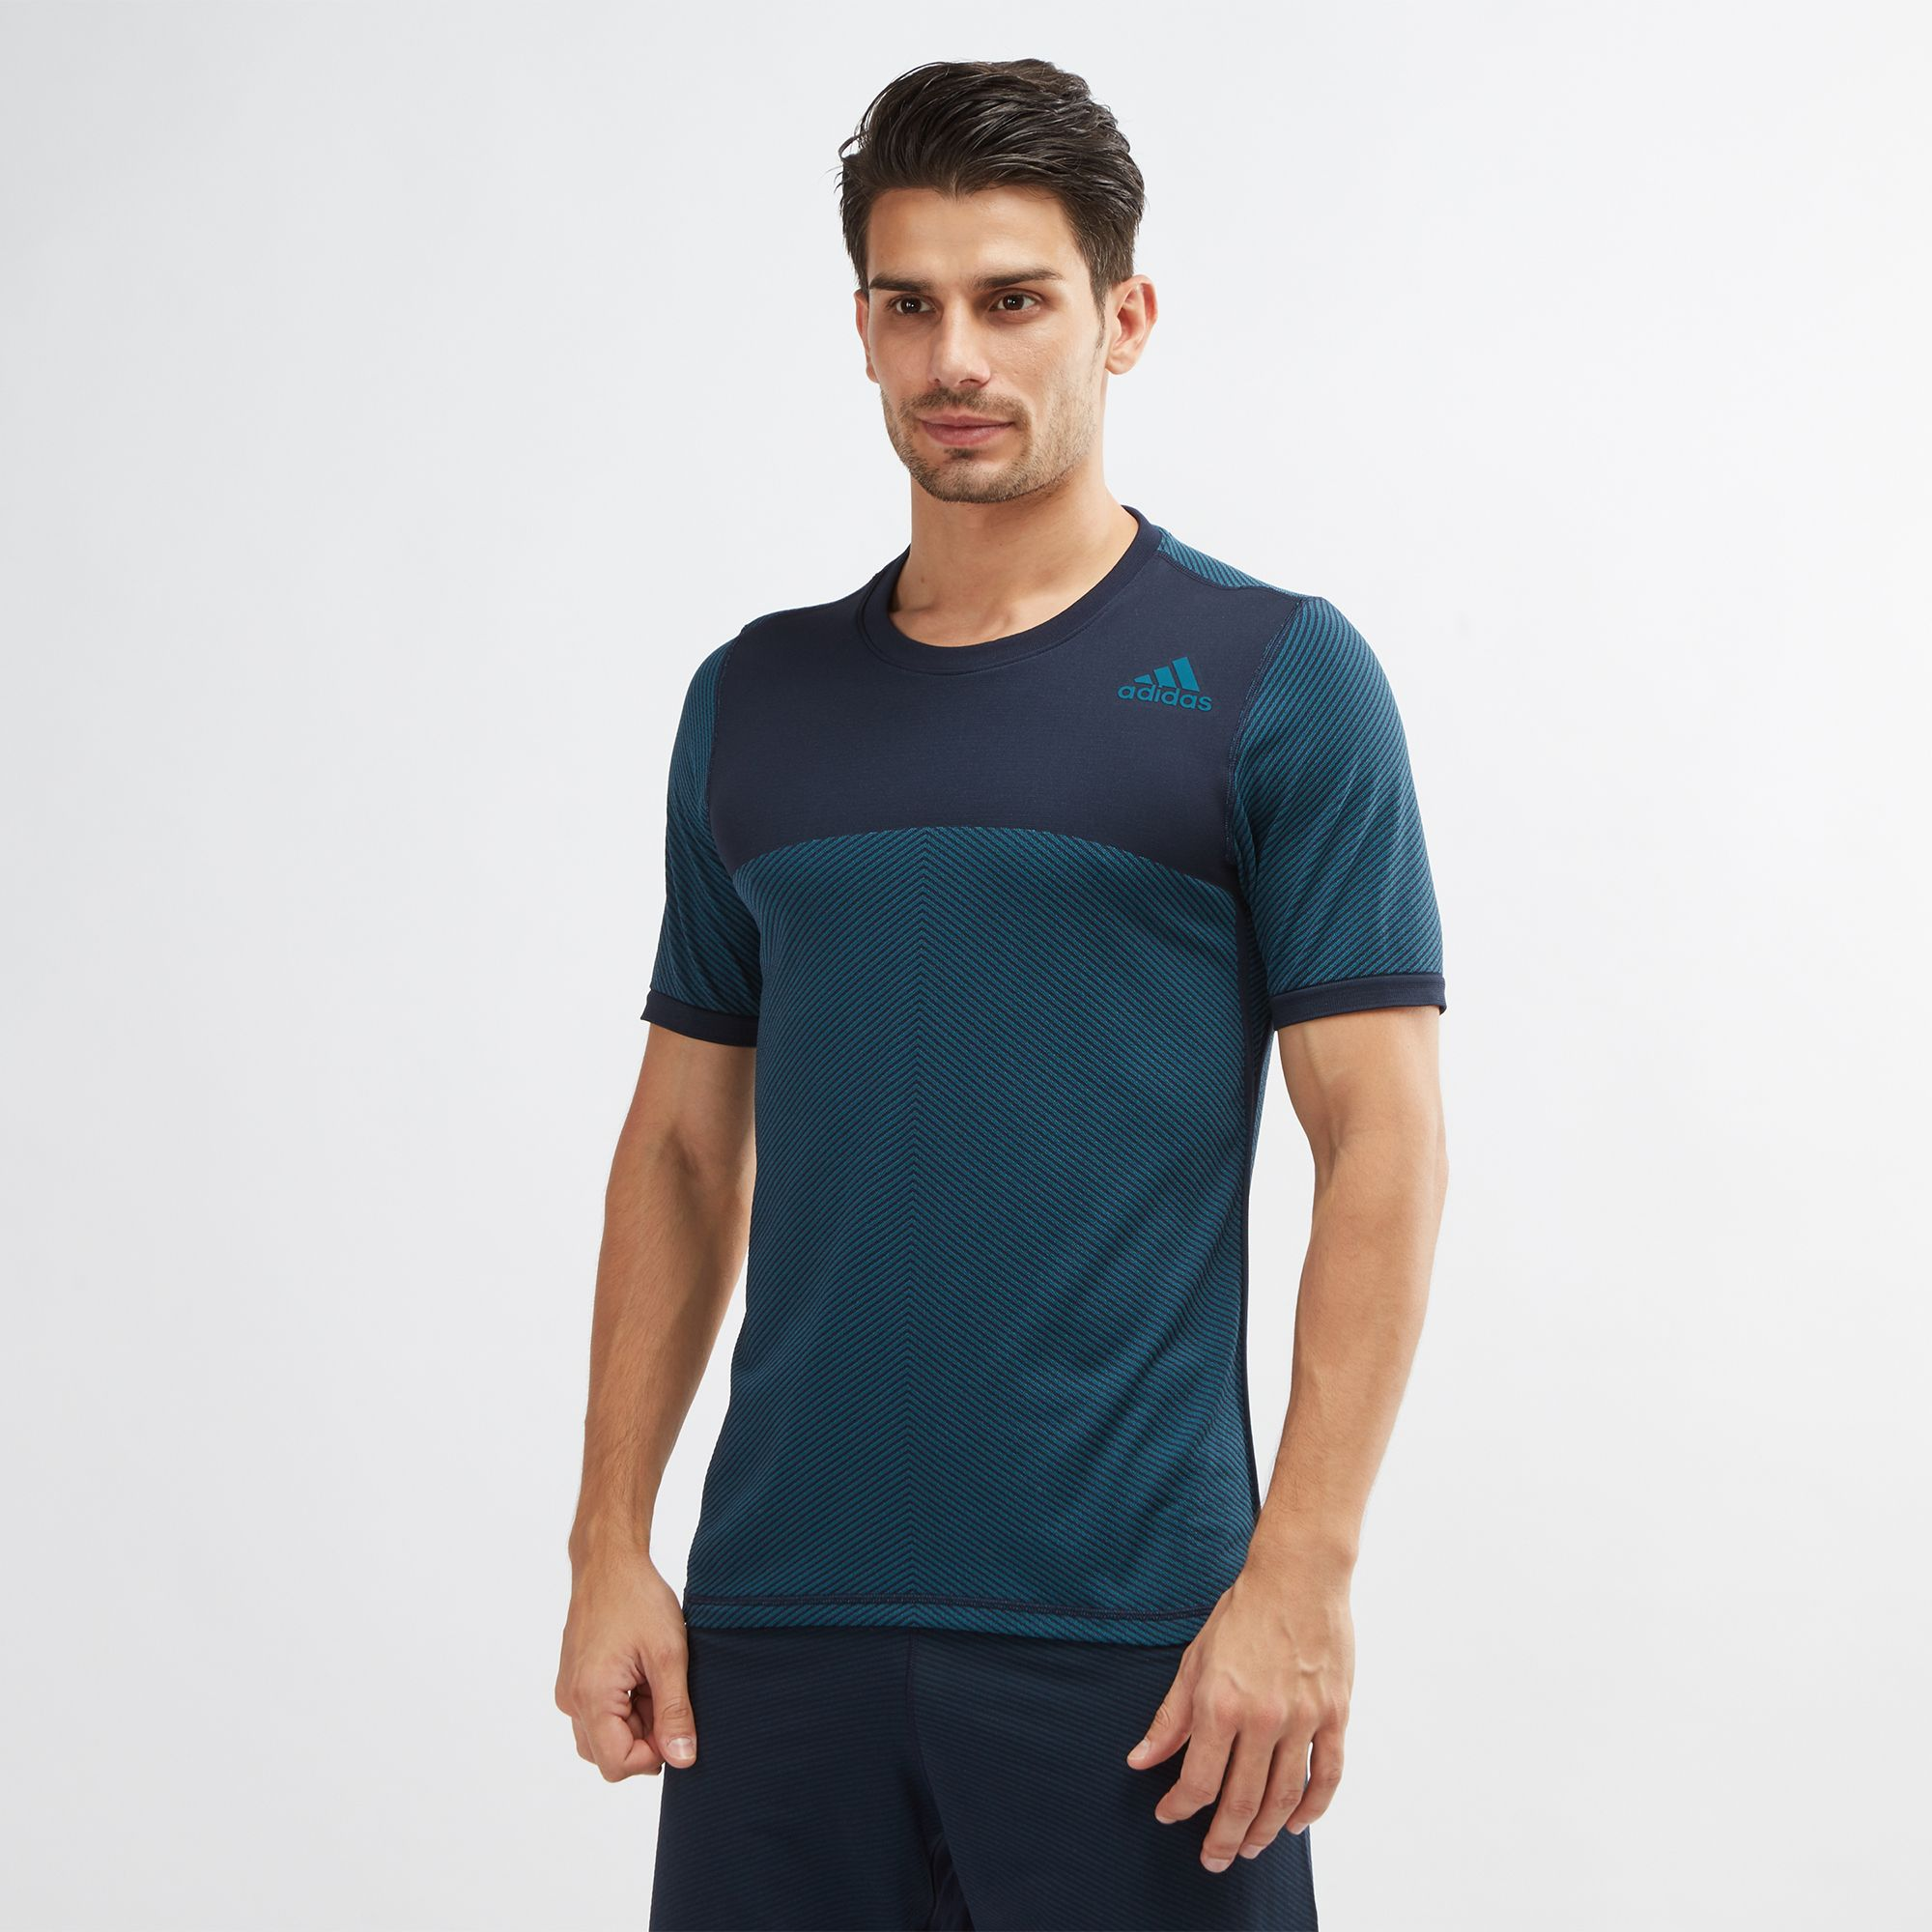 Elite ShirtShirts Fitted Adidas Freelift T Tops Sss Clothing qzGSUMpV